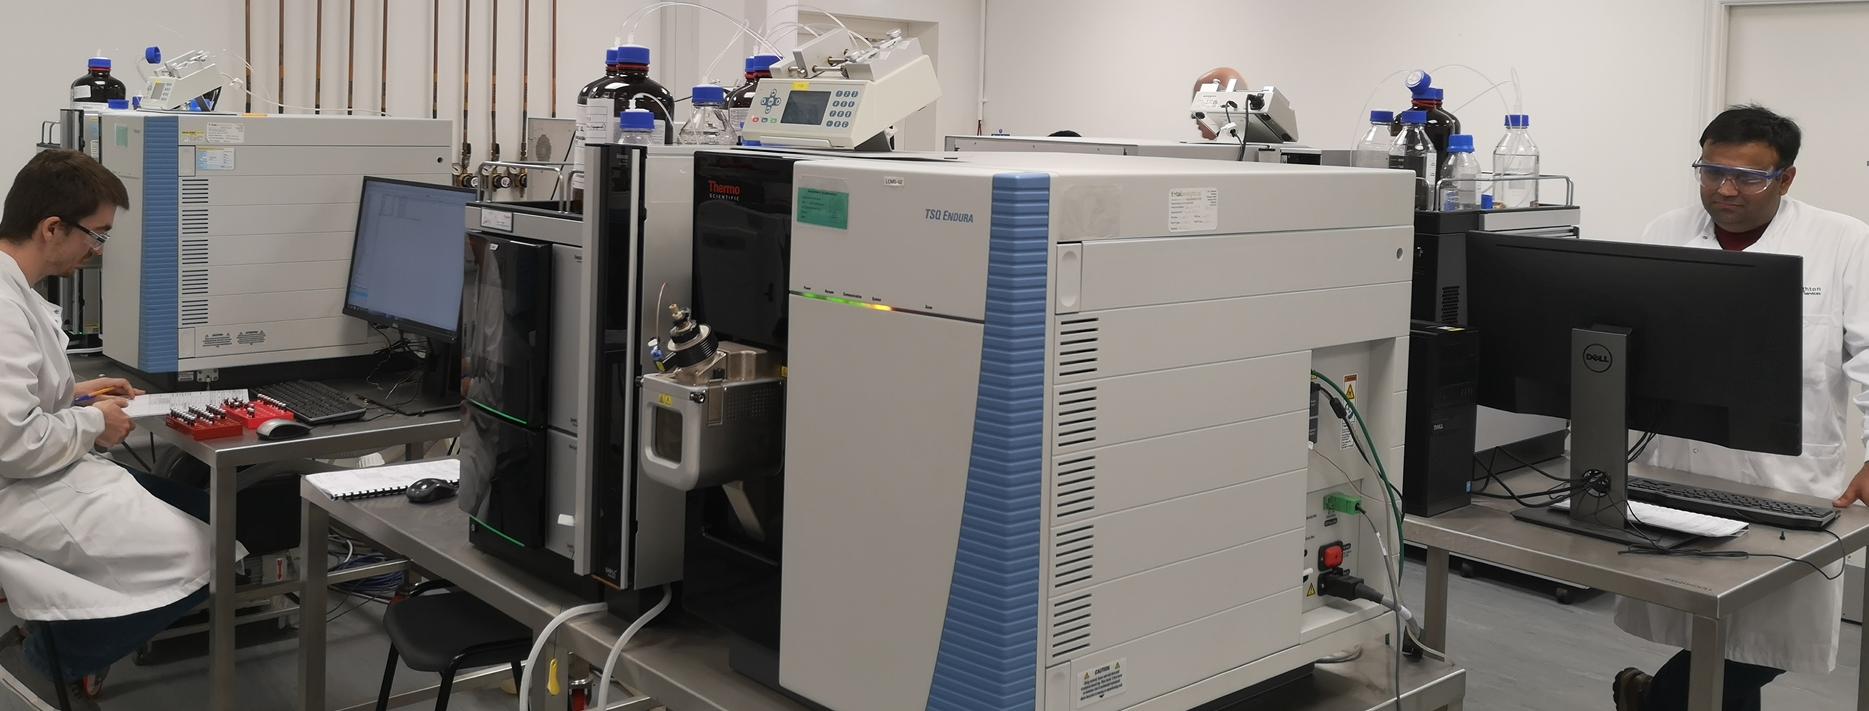 lab picture2